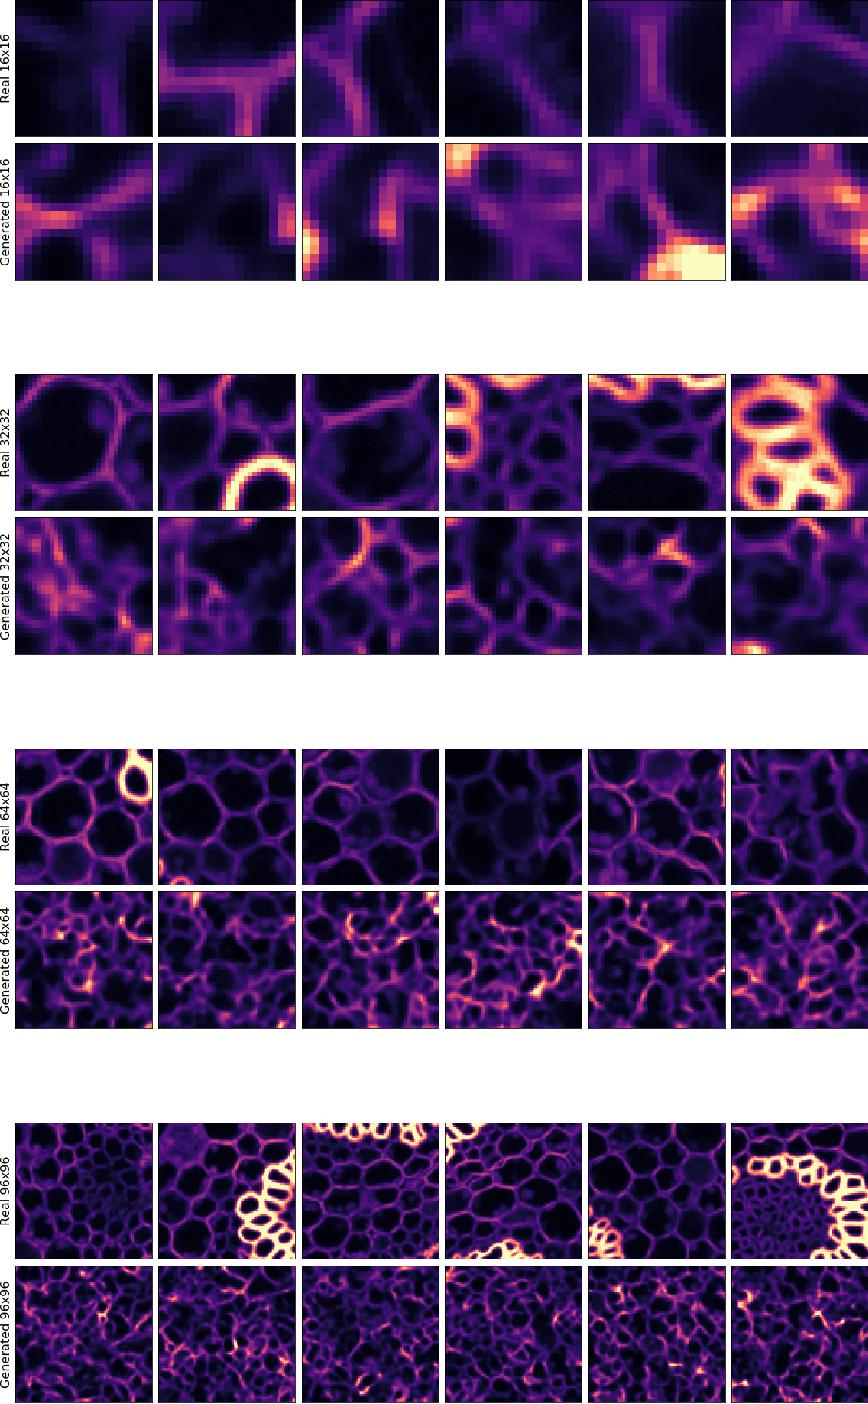 Figure 4 for DivNoising: Diversity Denoising with Fully Convolutional Variational Autoencoders